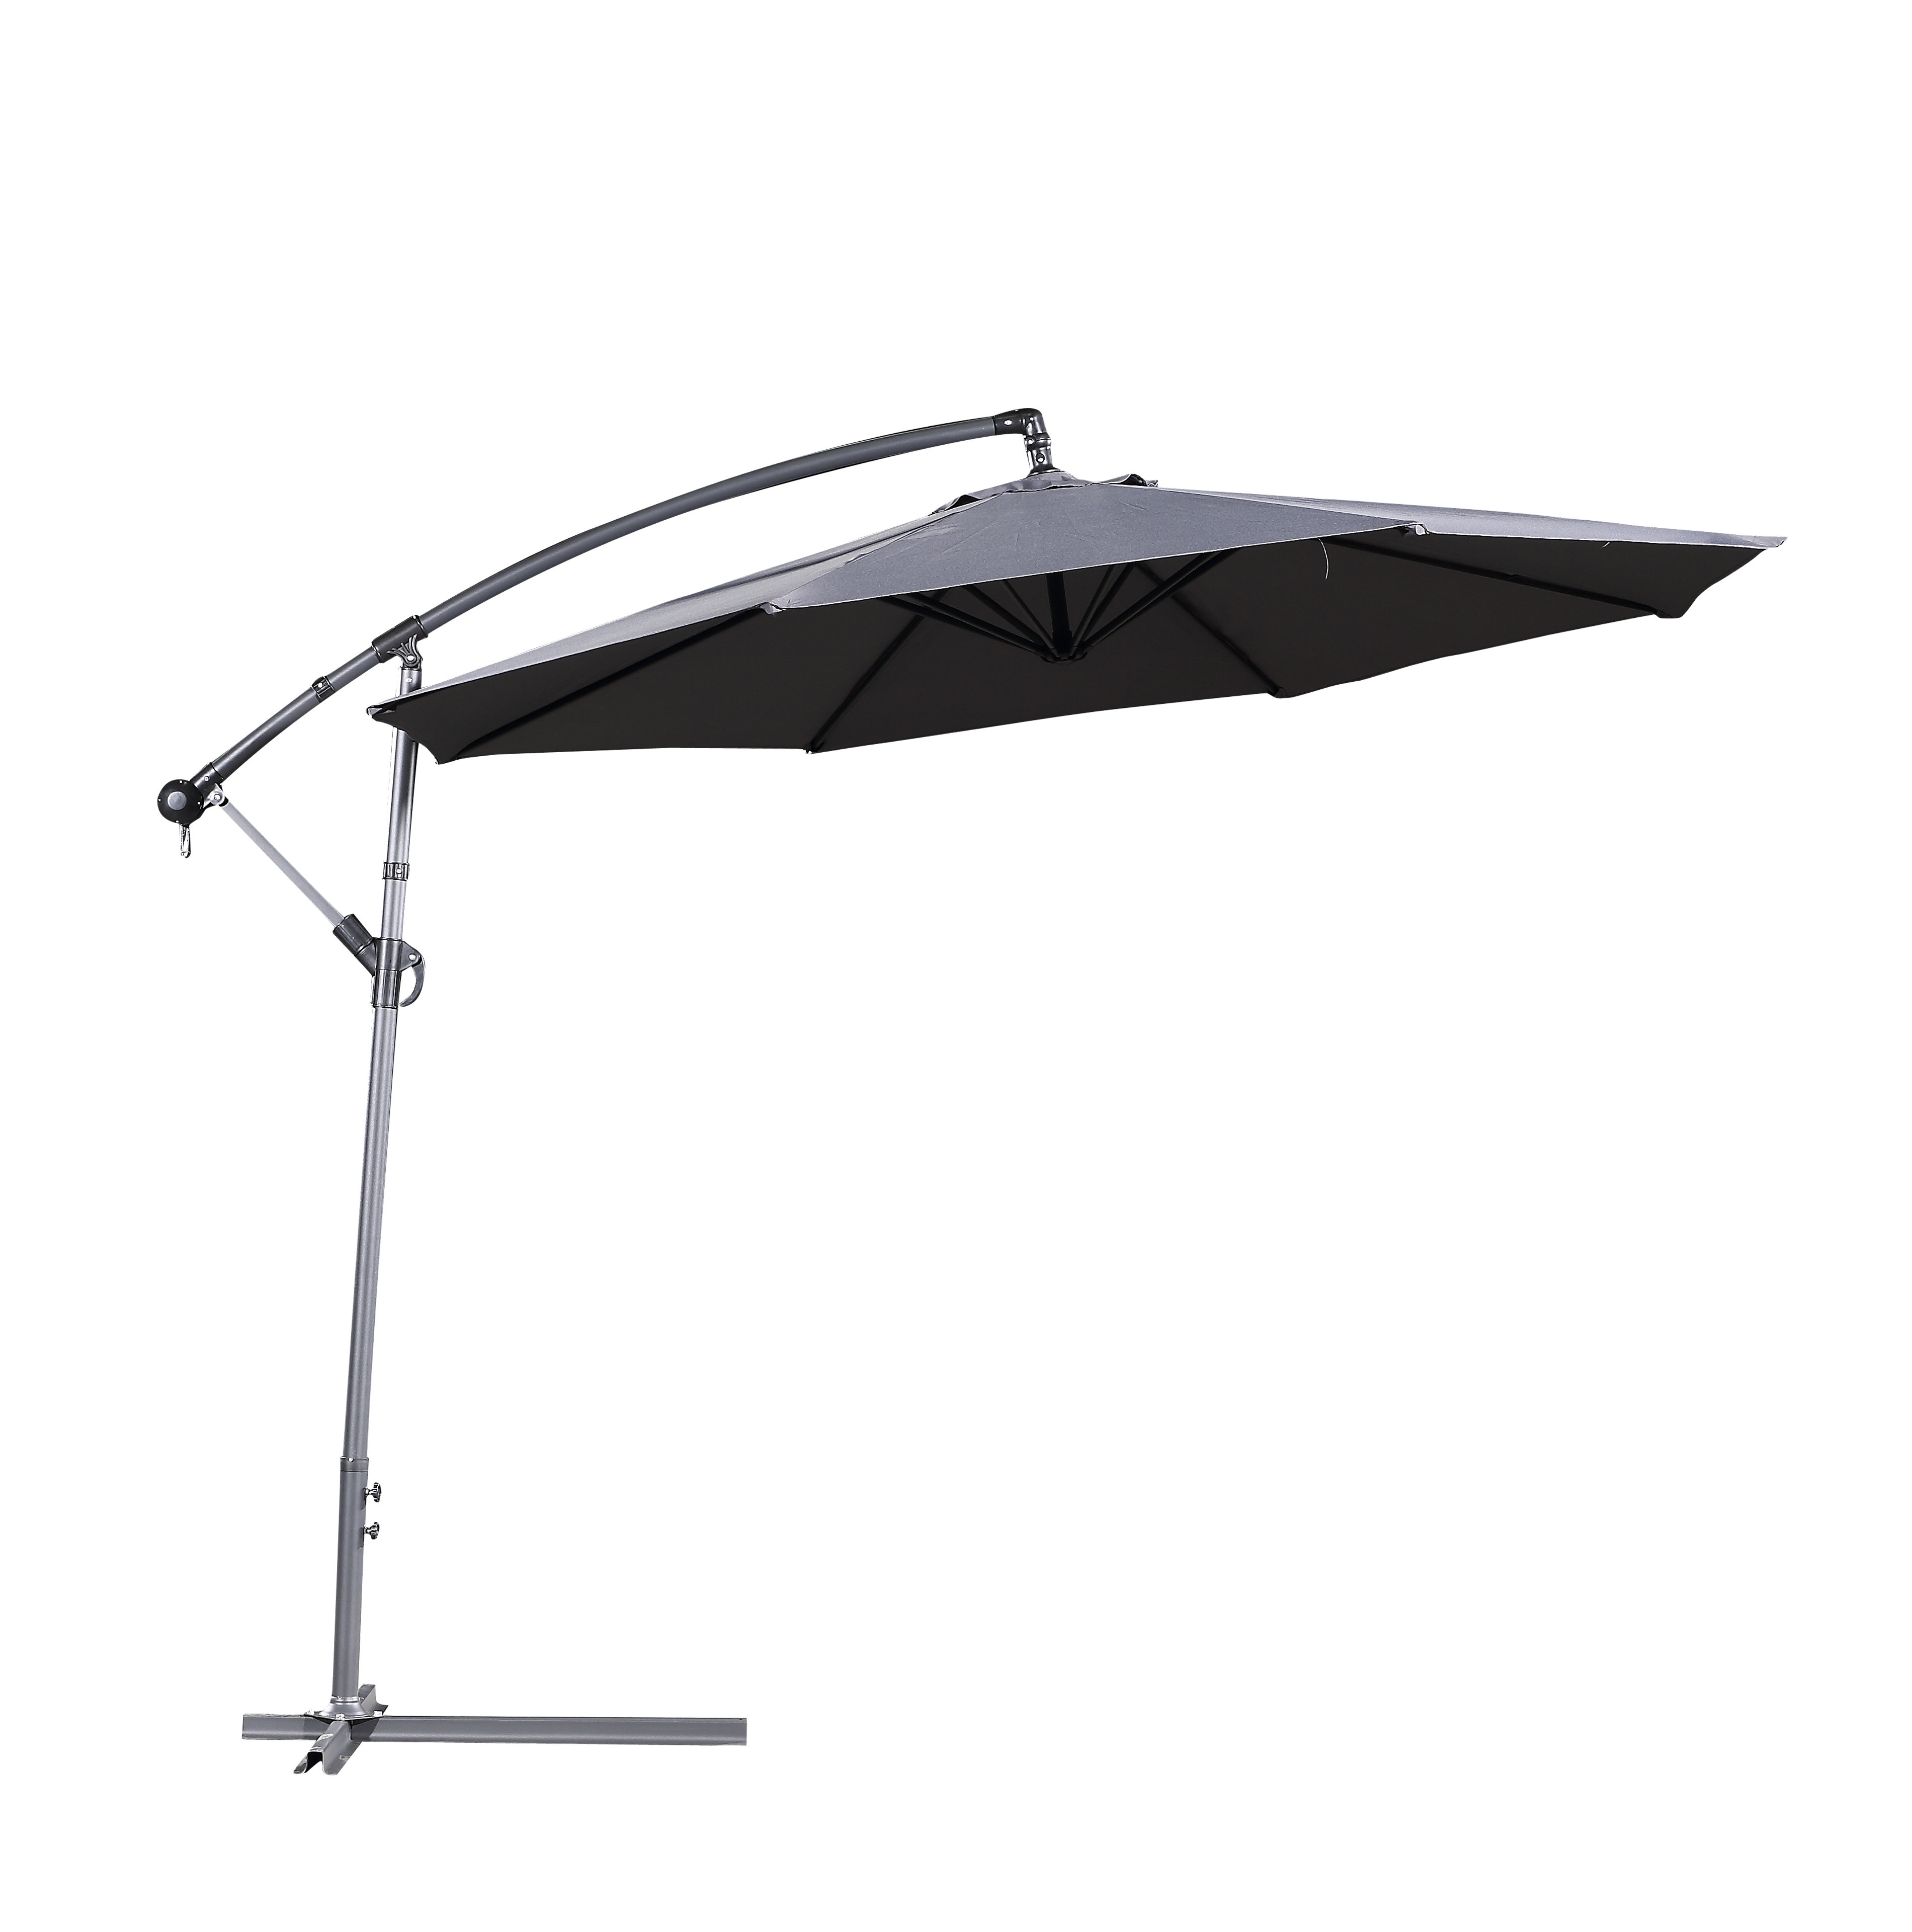 Dore Patio Cantilever Umbrellas Pertaining To Most Up To Date Latitude Run Dore Patio 10' Cantilever Umbrella (View 6 of 20)